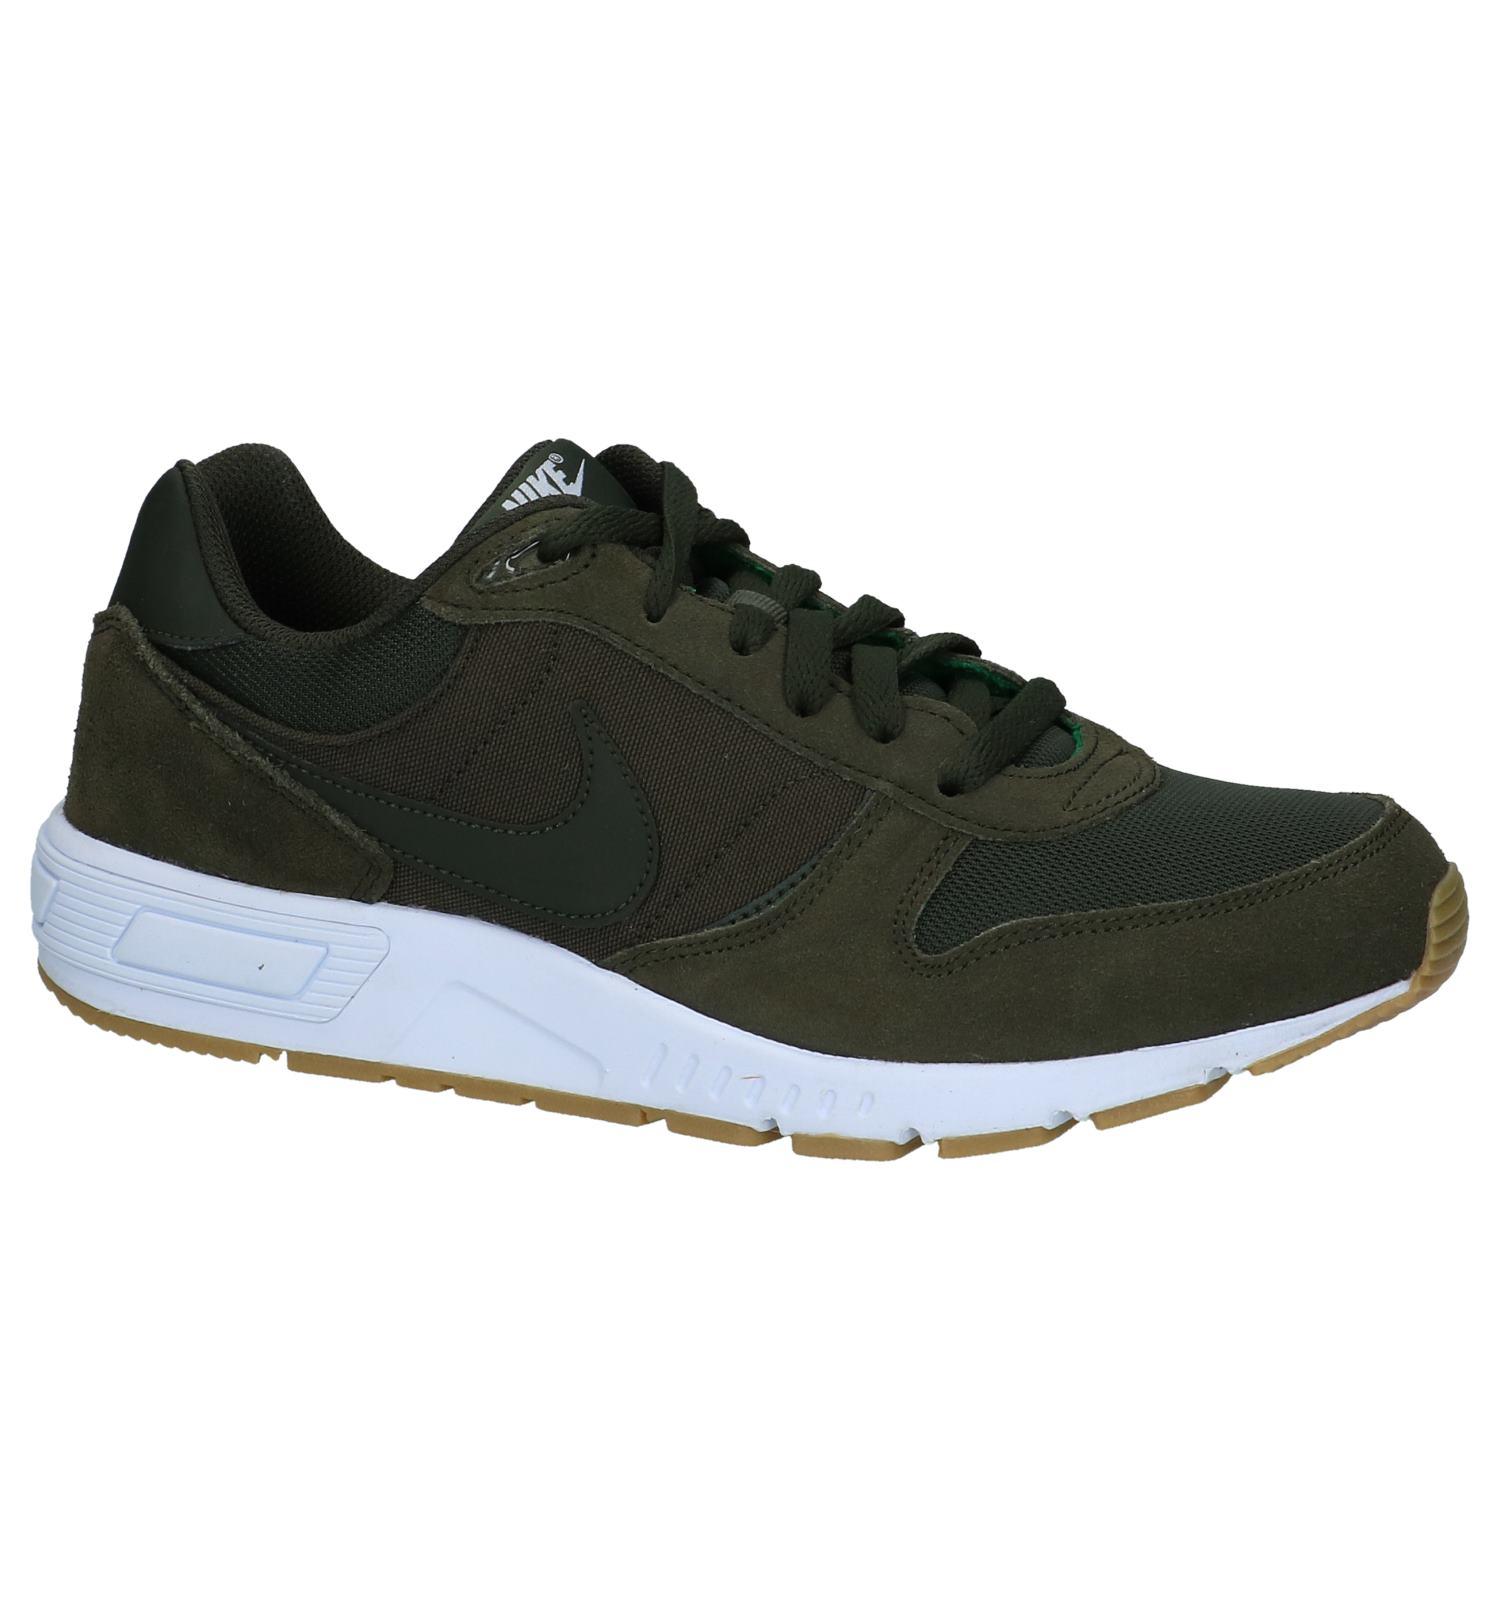 Verzend En Sneakers Kaki Retour Torfs Lage be Nike Gratis Nightgazer 00qn58